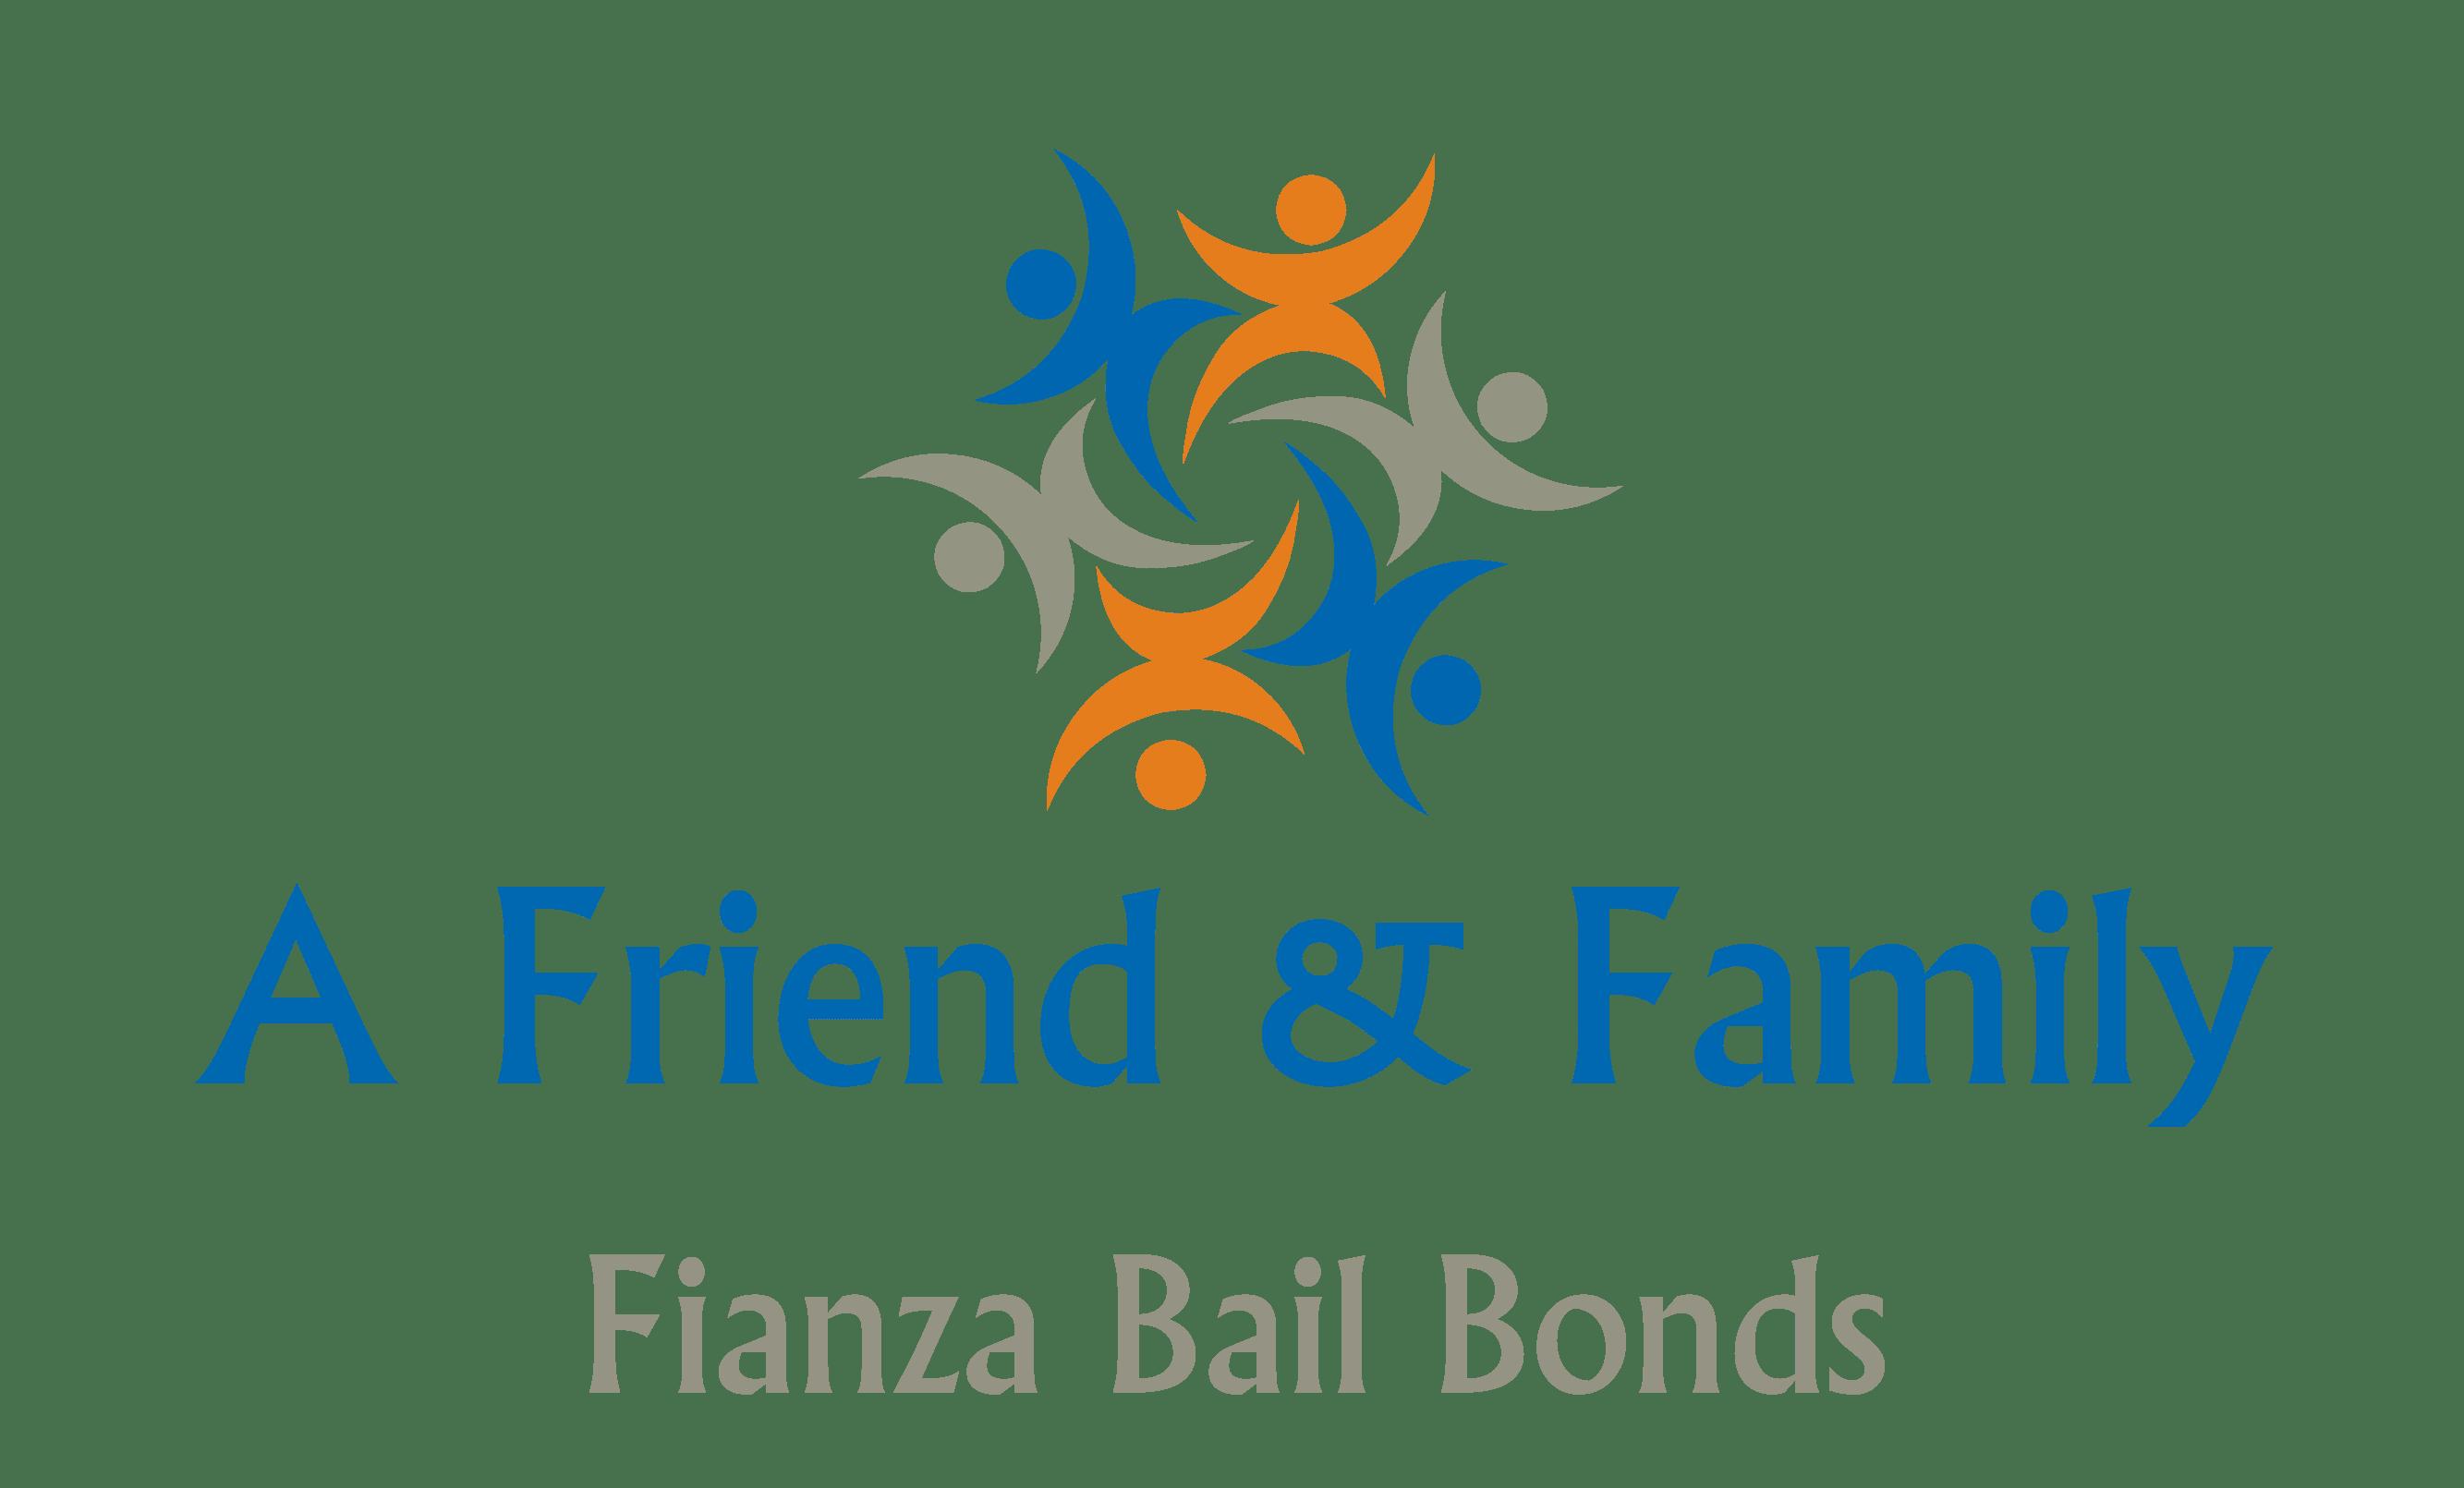 A Friend and Family Fianza Bail Bonds